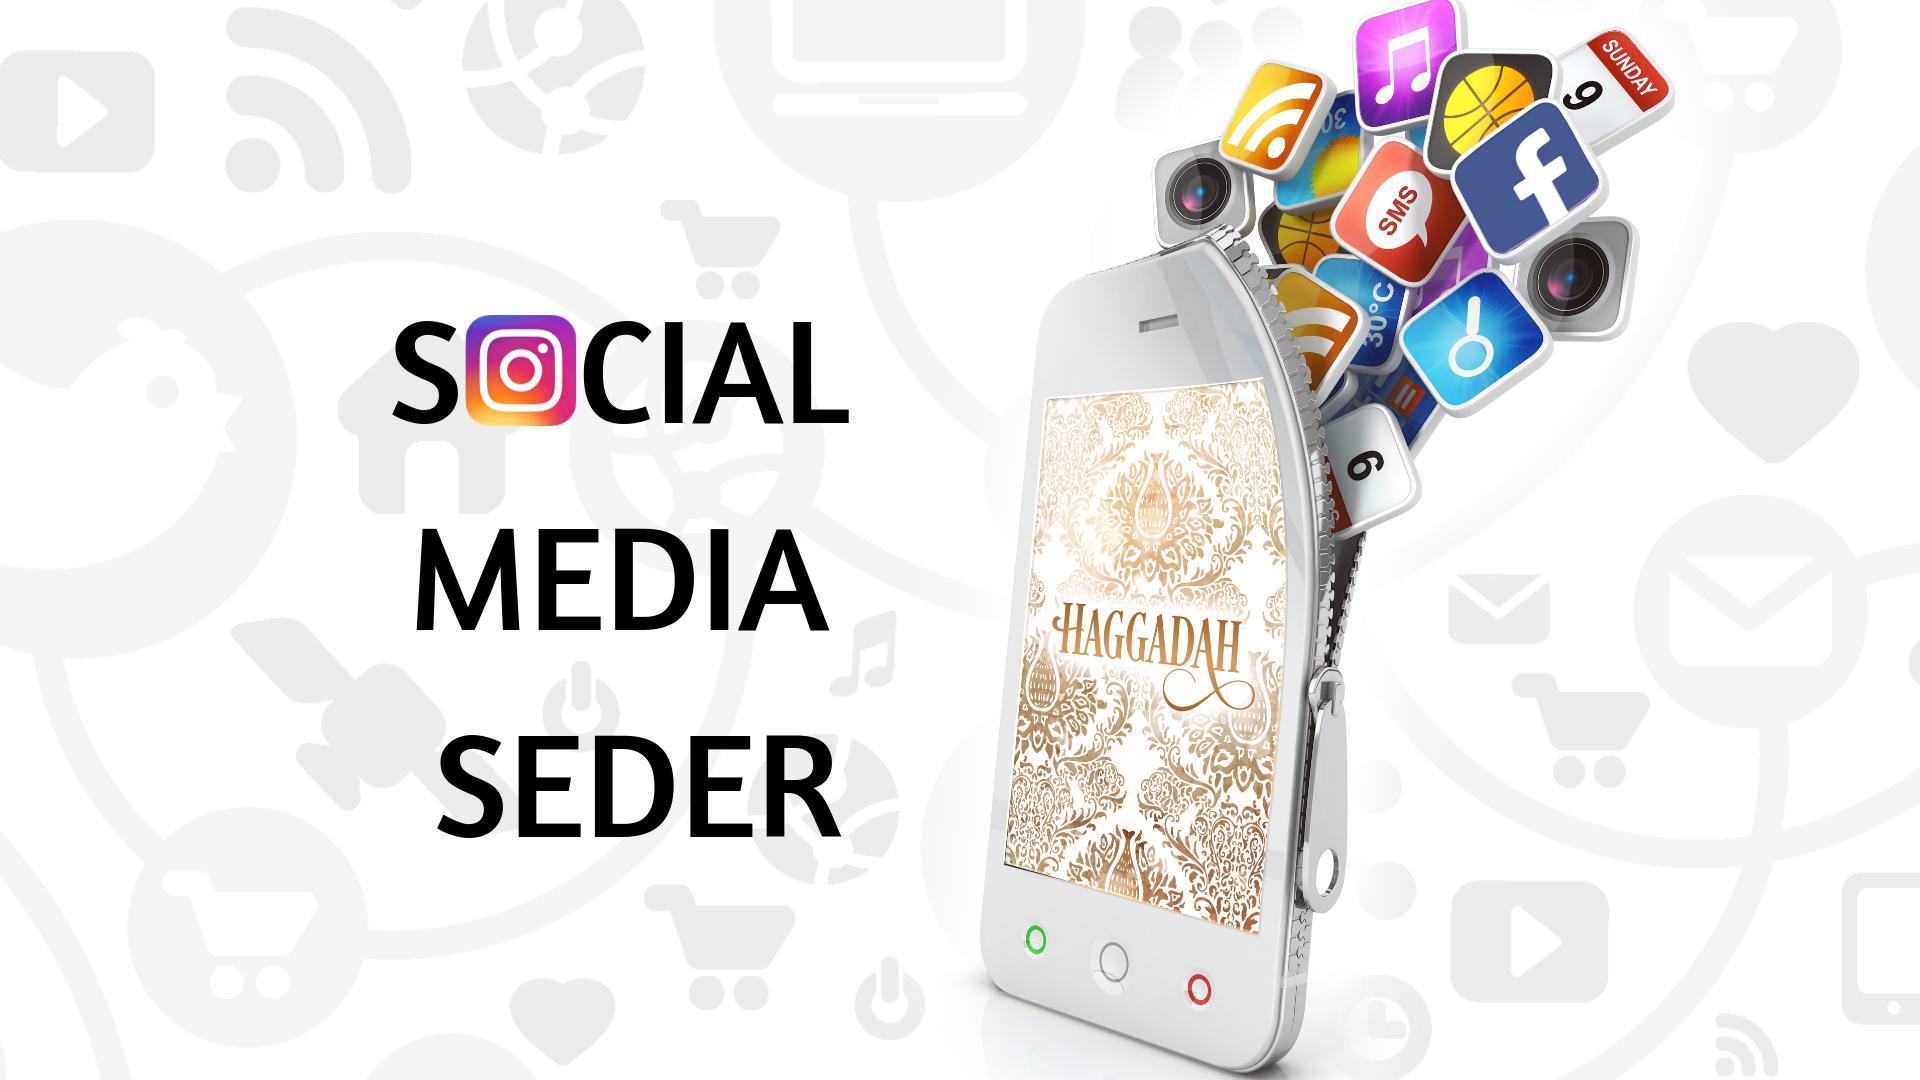 social media Passover Seder.png